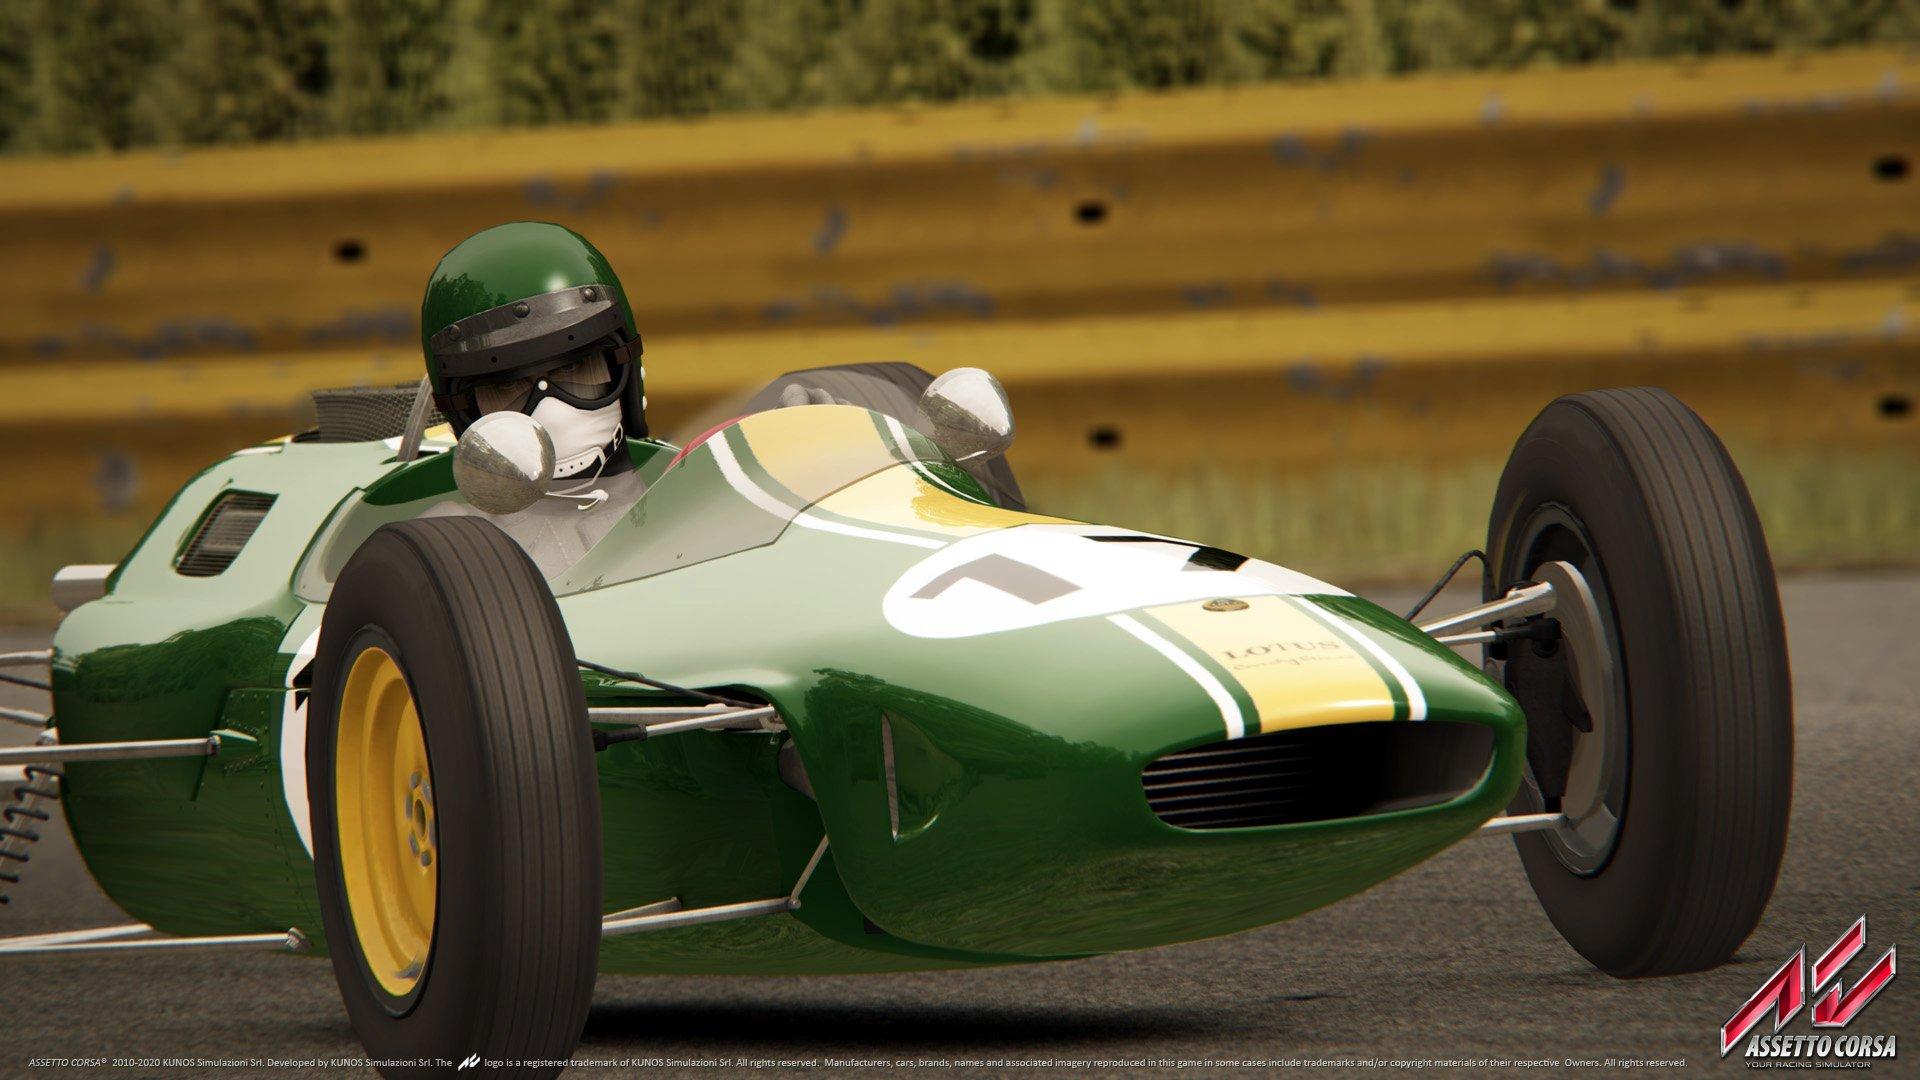 Assetto Corsa Dream Pack 3 17